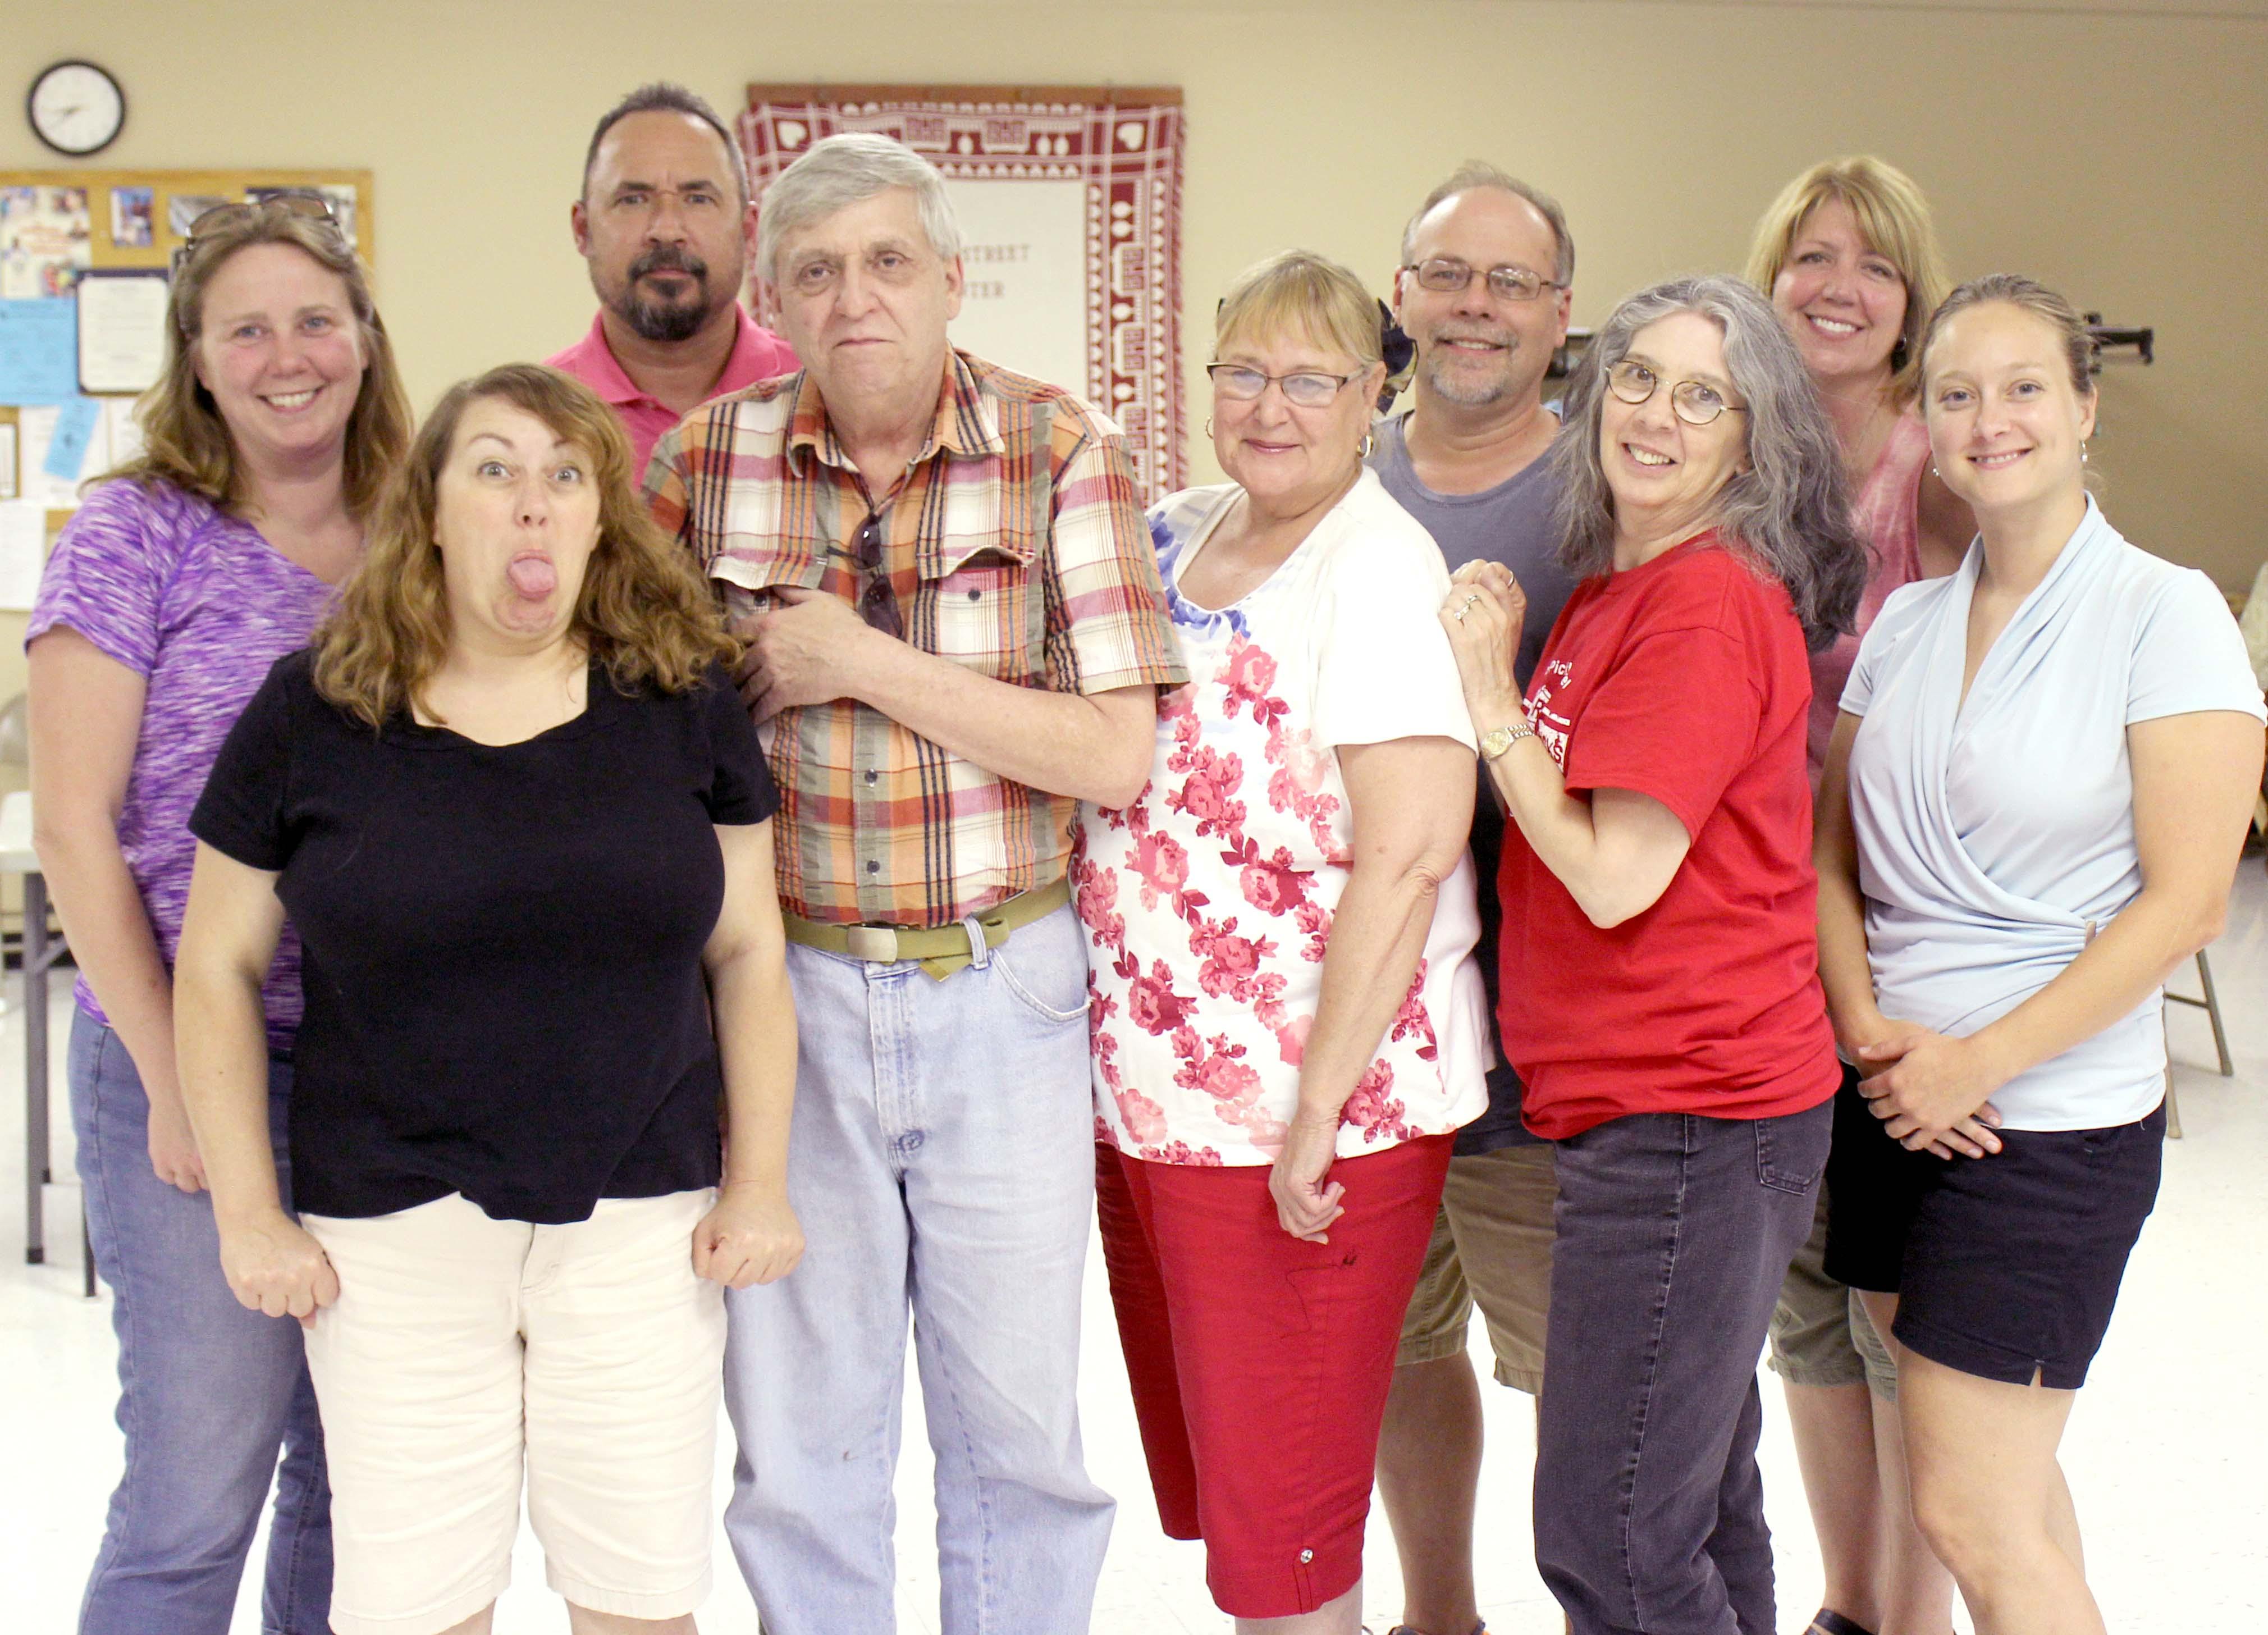 Arlene Cast Clarion Community Theater